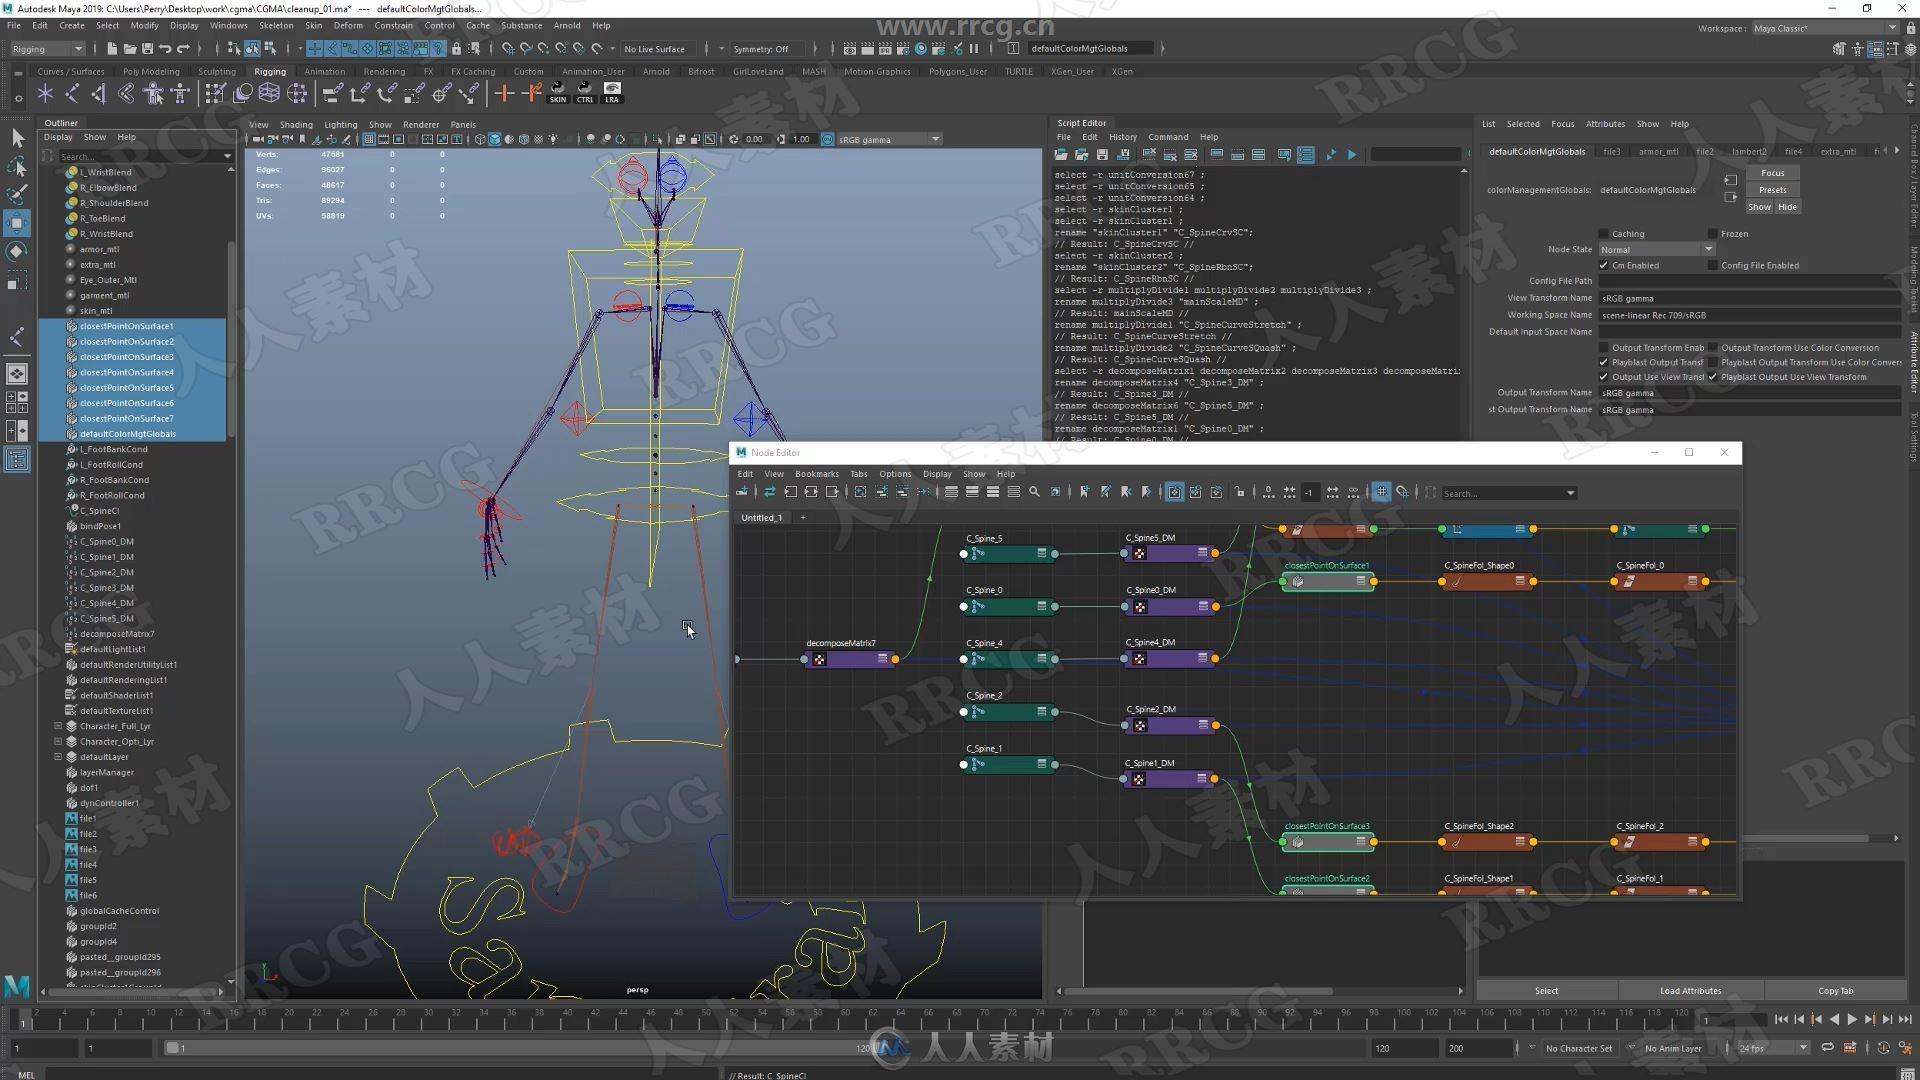 Maya游戏人物角色骨骼动画工作流程视频教程